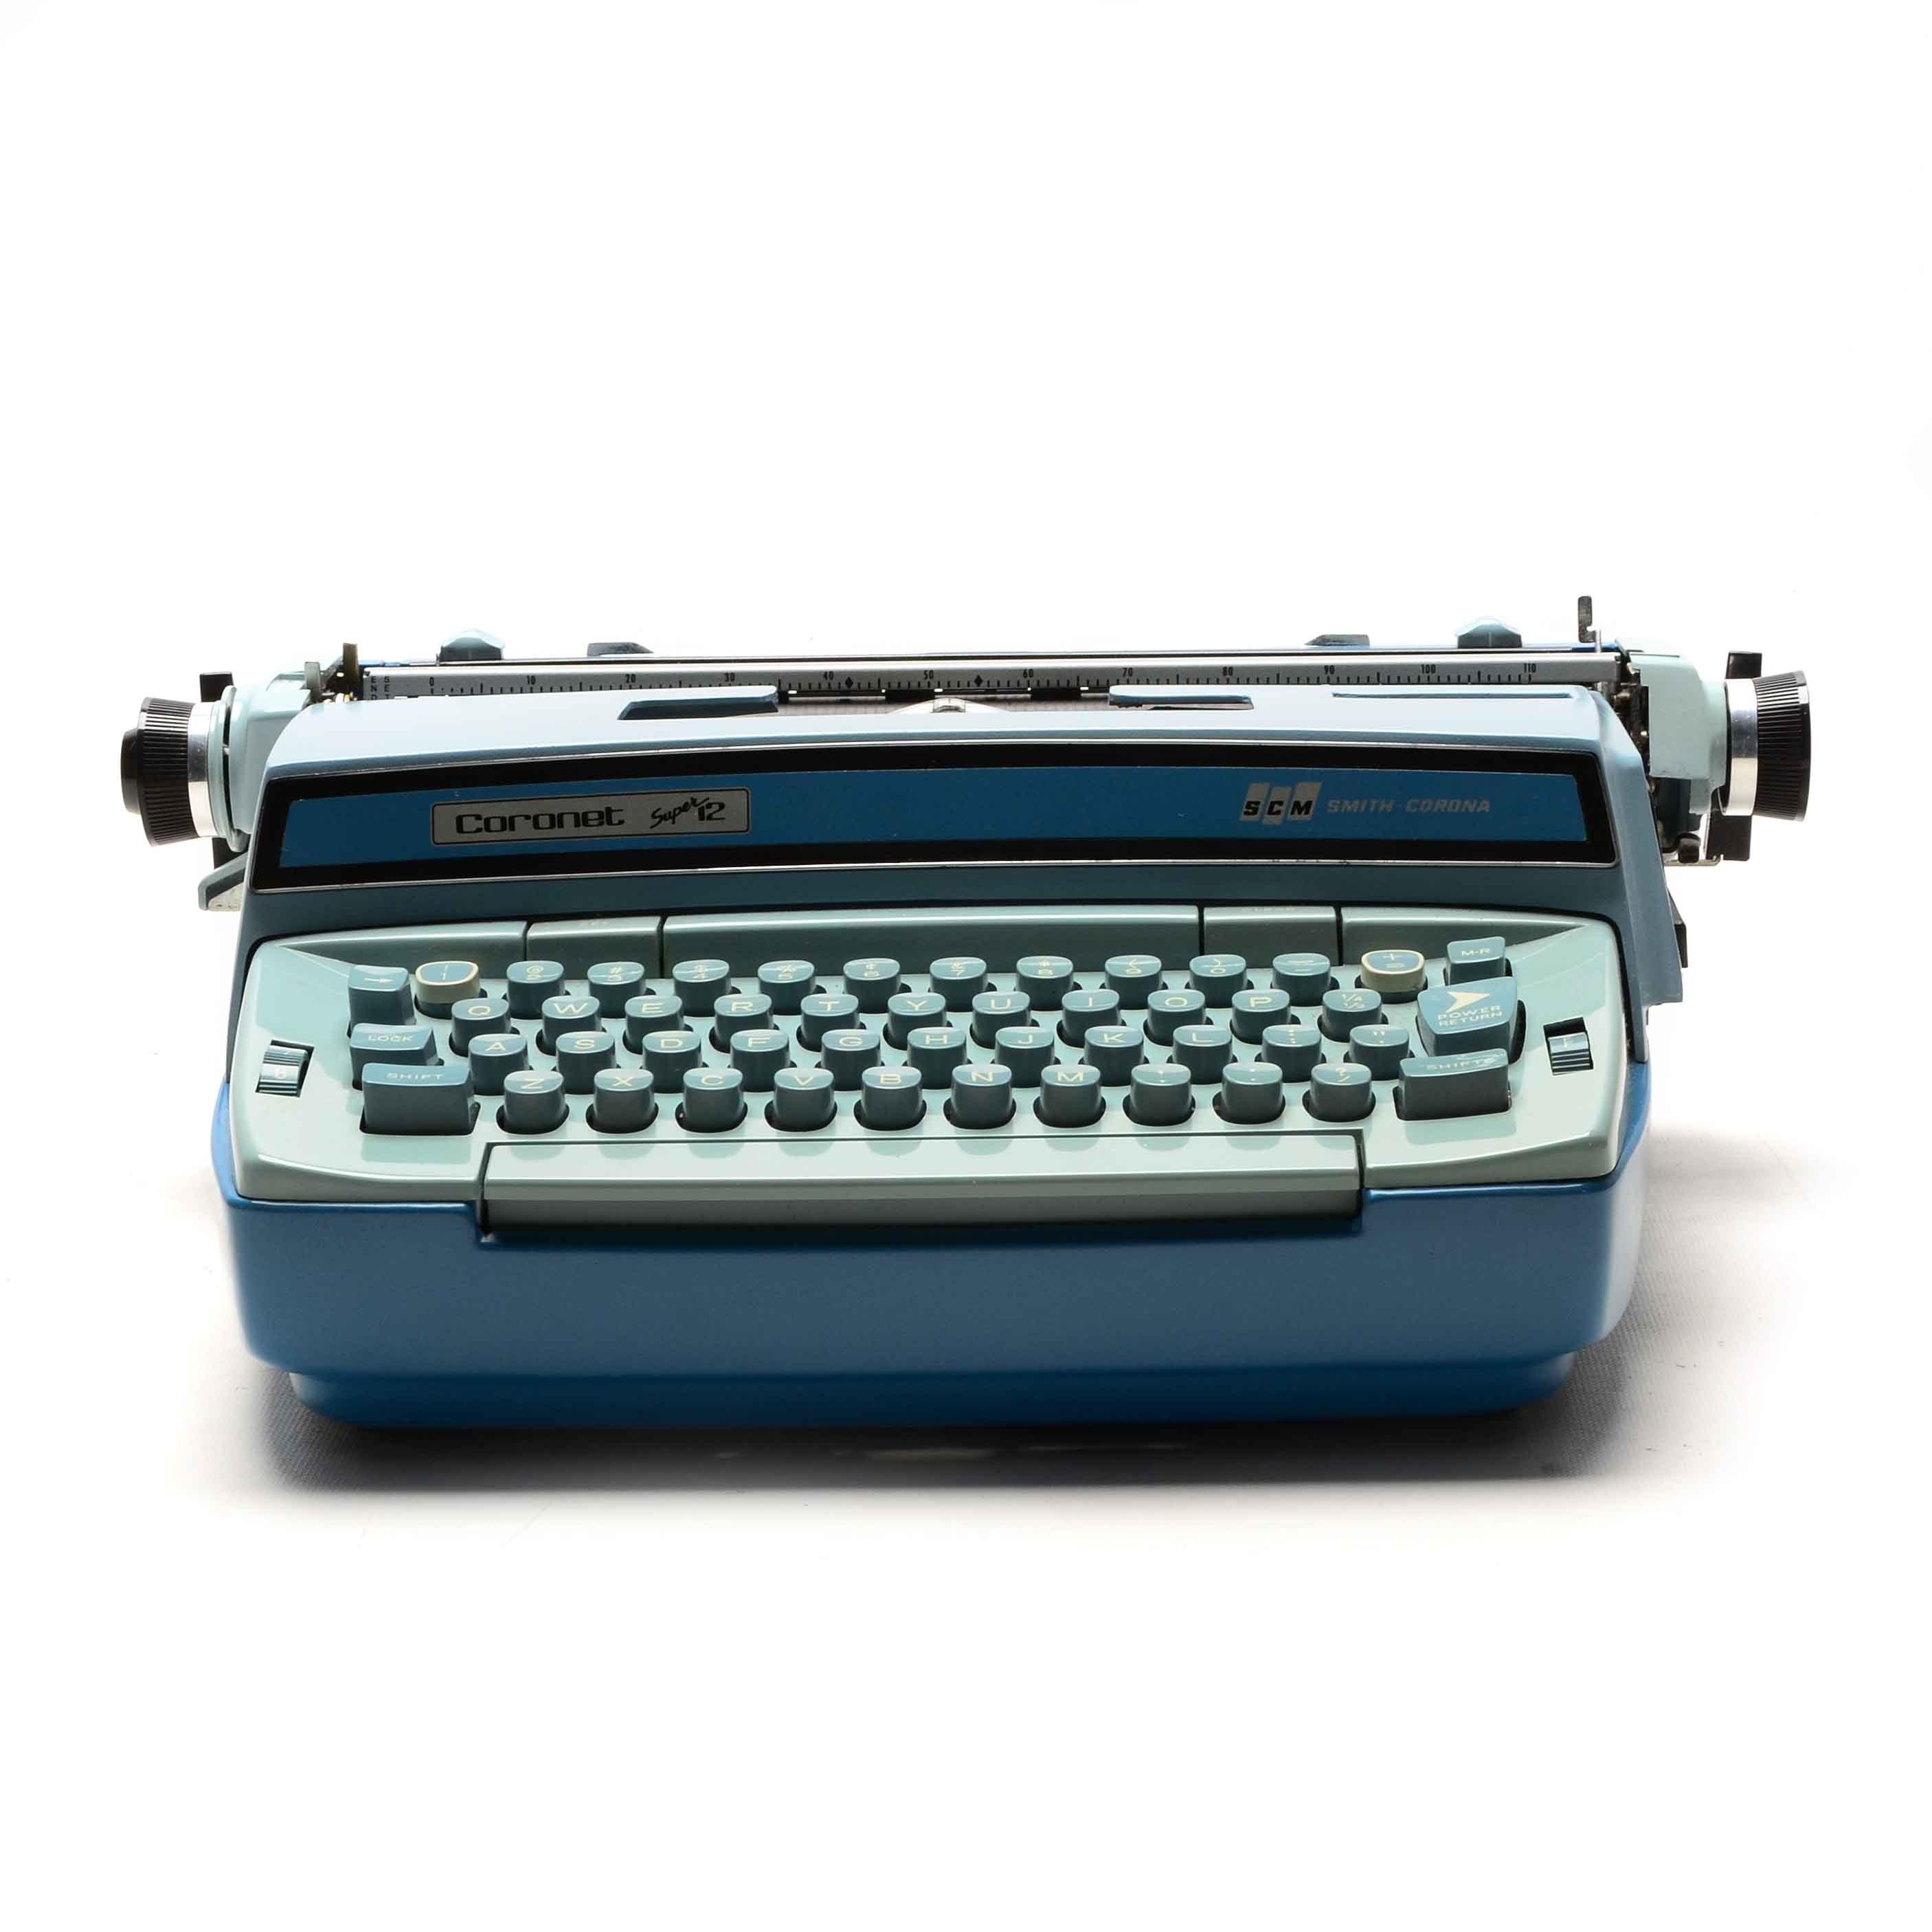 "Smith-Corona ""Coronet Super 12"" Electric Typewriter with Case"